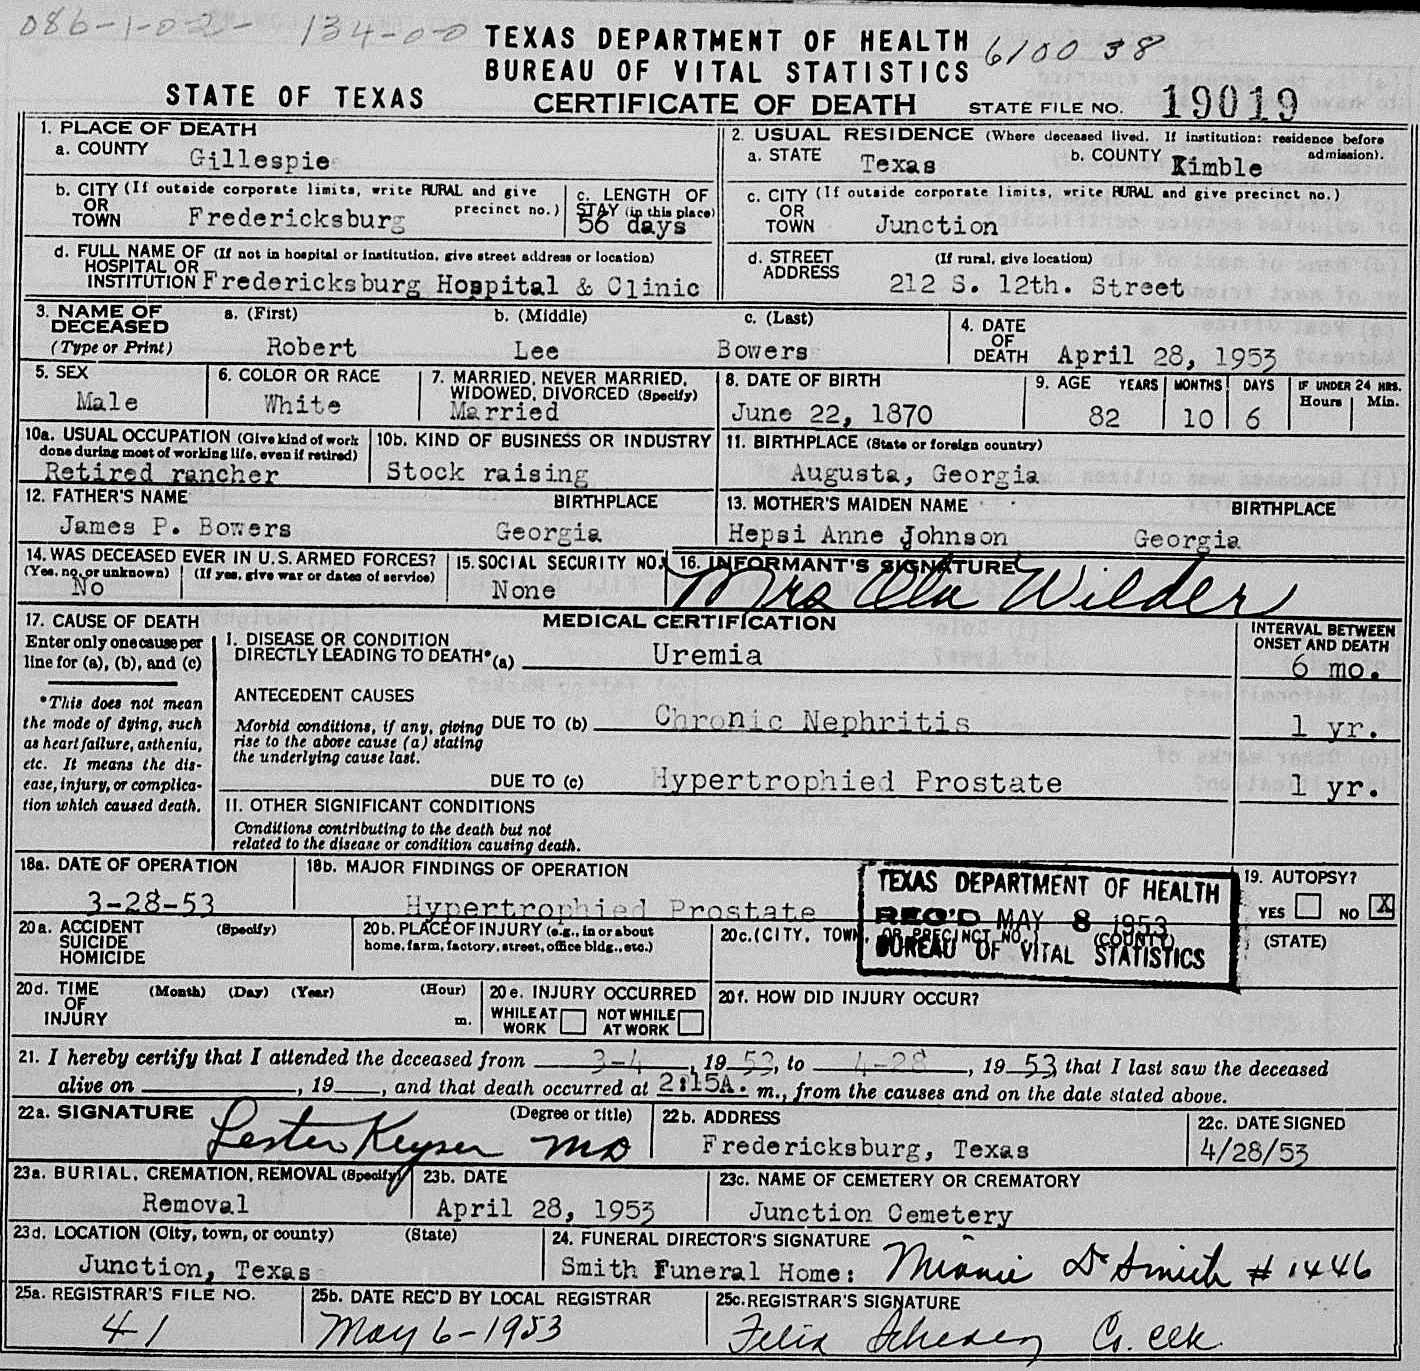 Robert Bowers Death Certificate